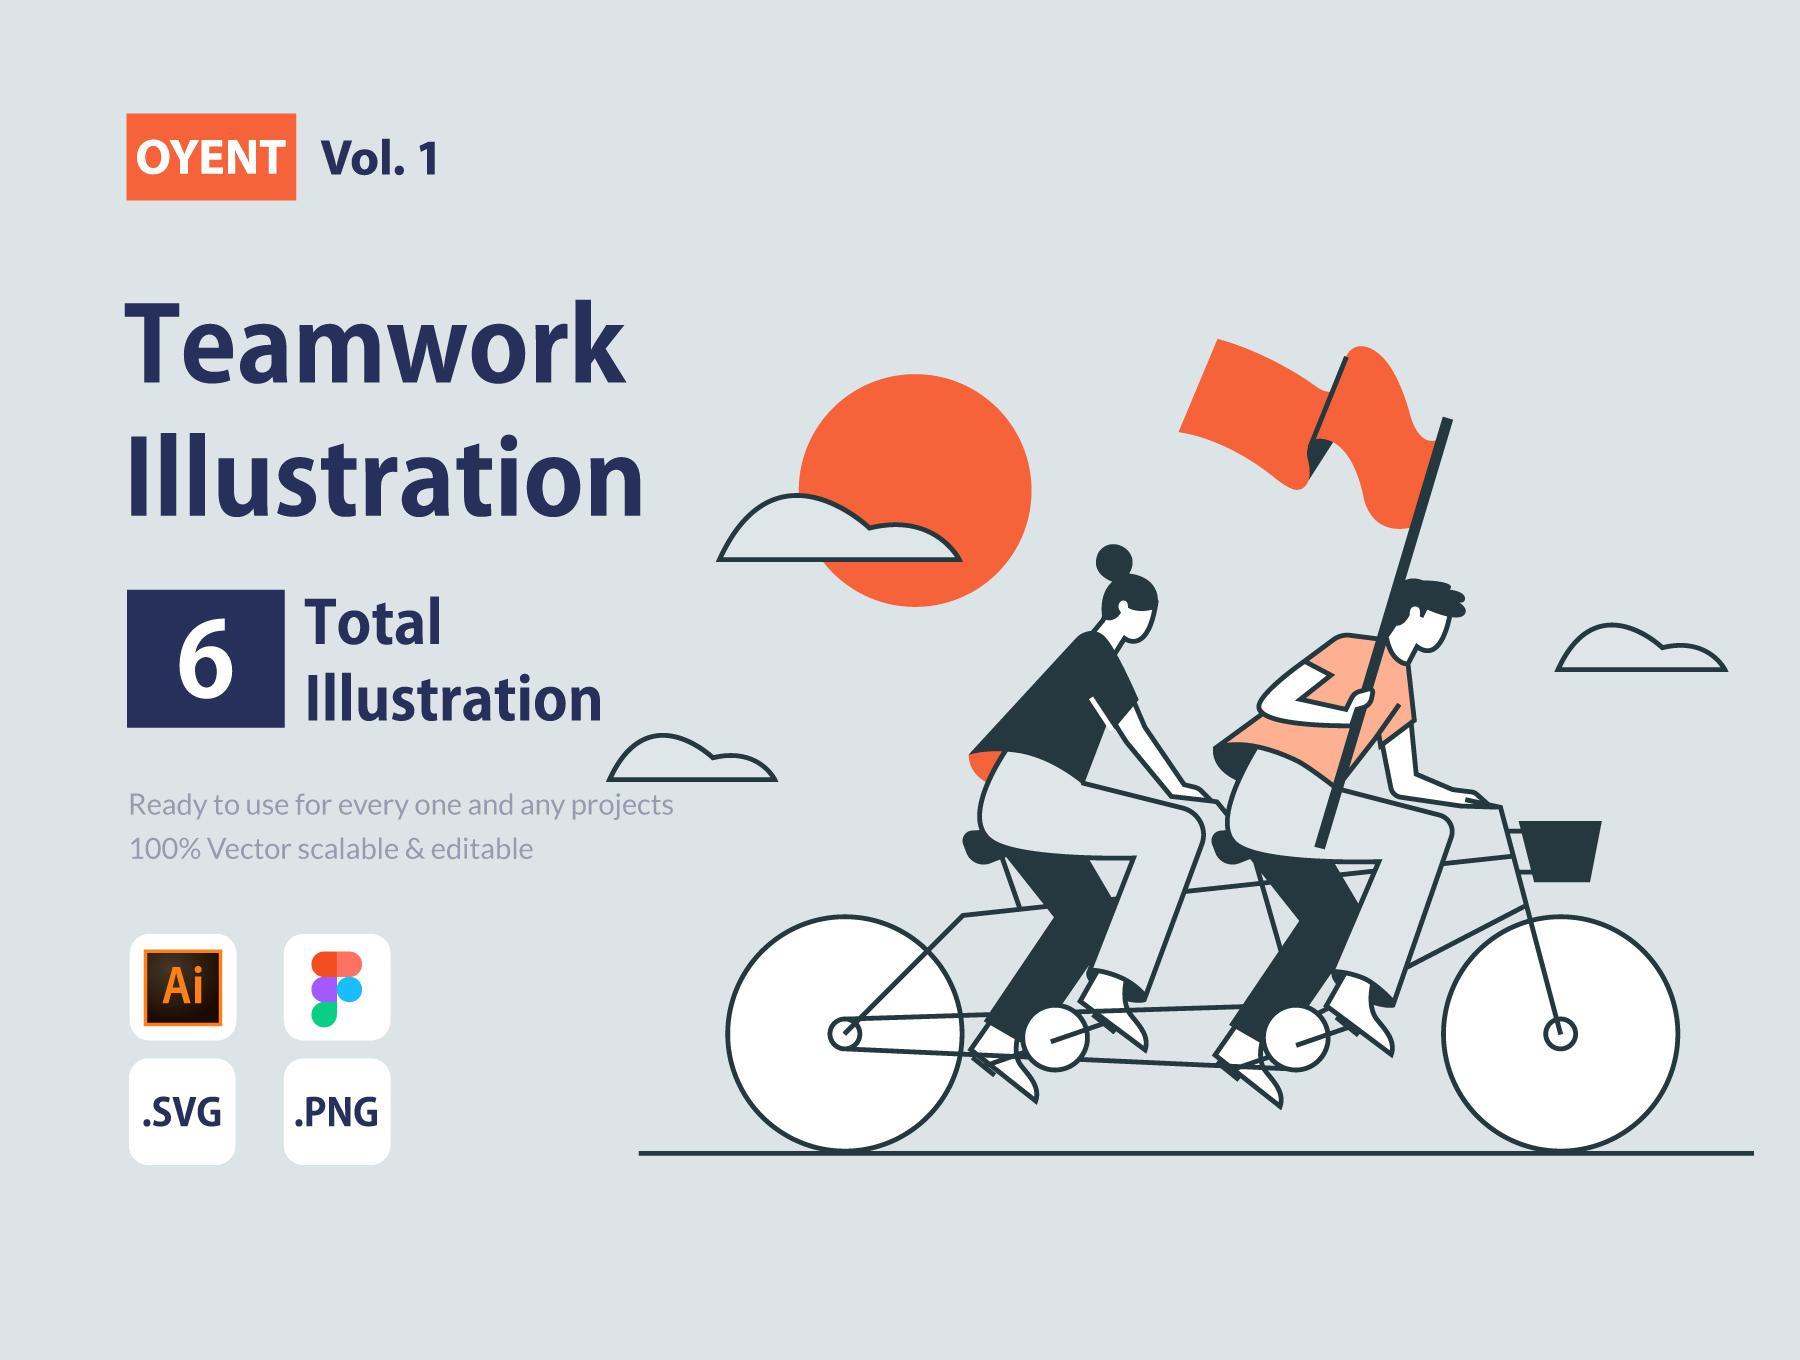 OYENT – Teamwork Illustration Pack